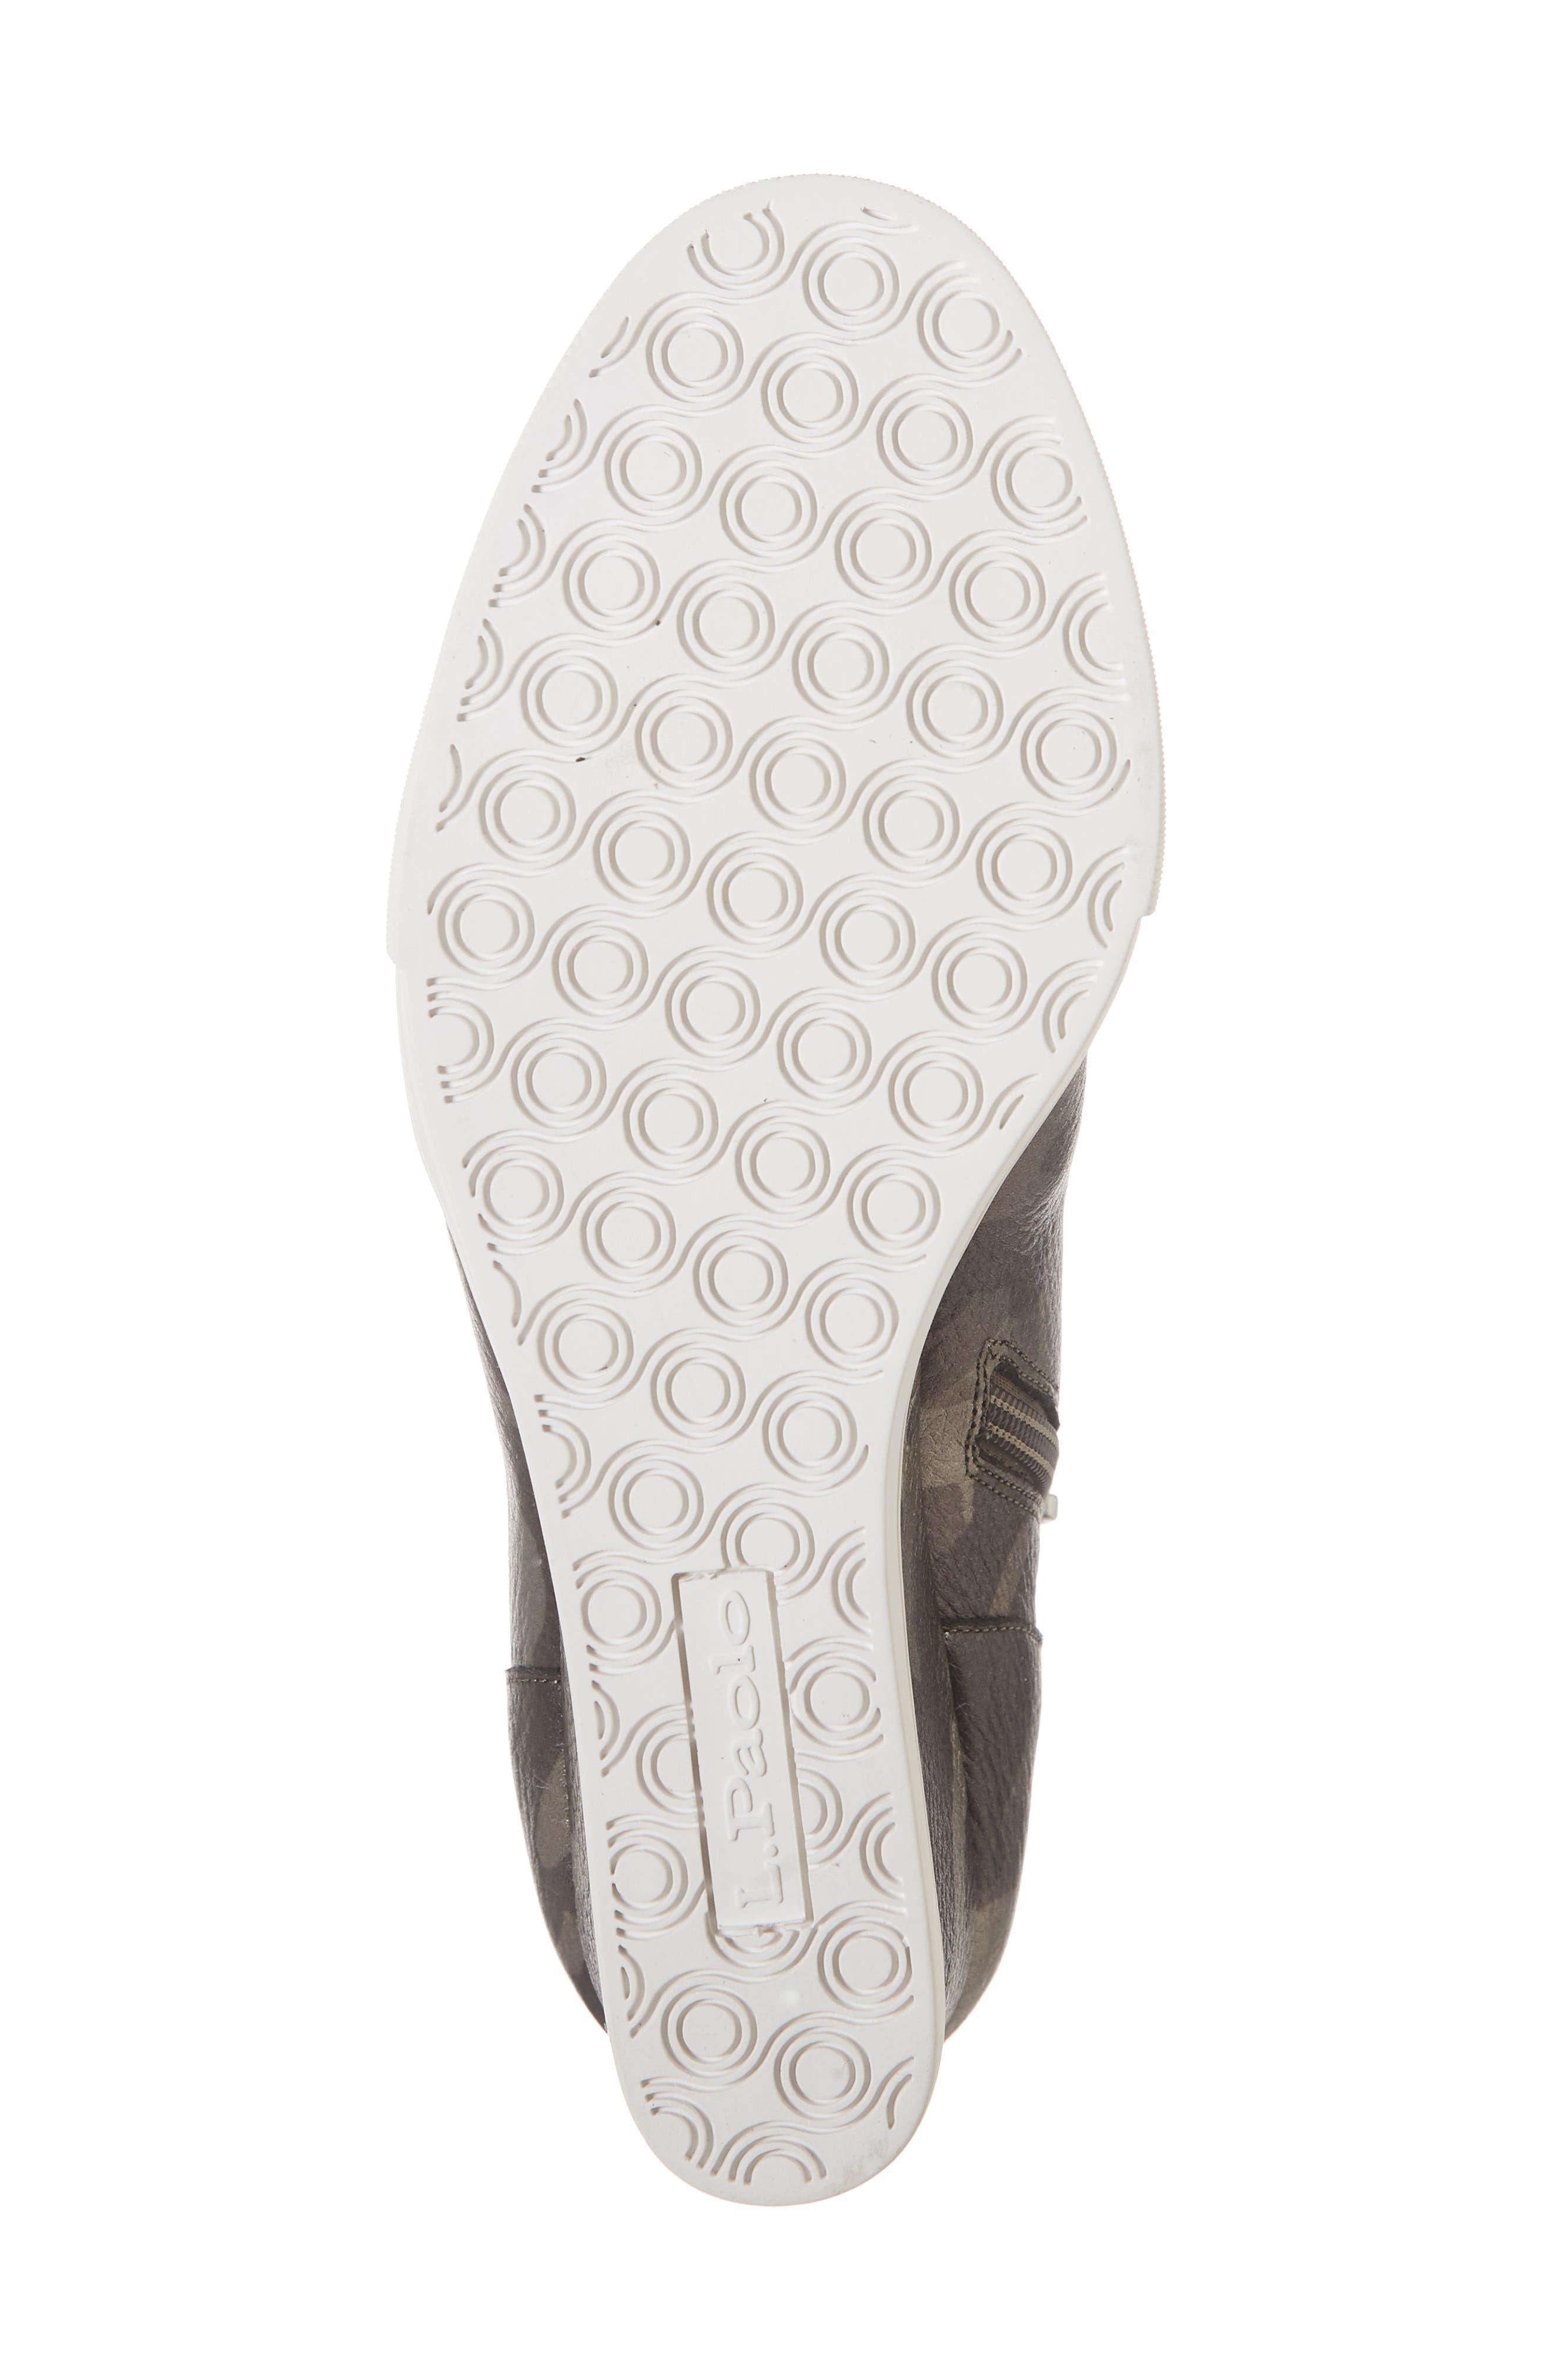 'Felicia' Wedge Bootie,                             Alternate thumbnail 3, color,                             Dark Grey Print Leather